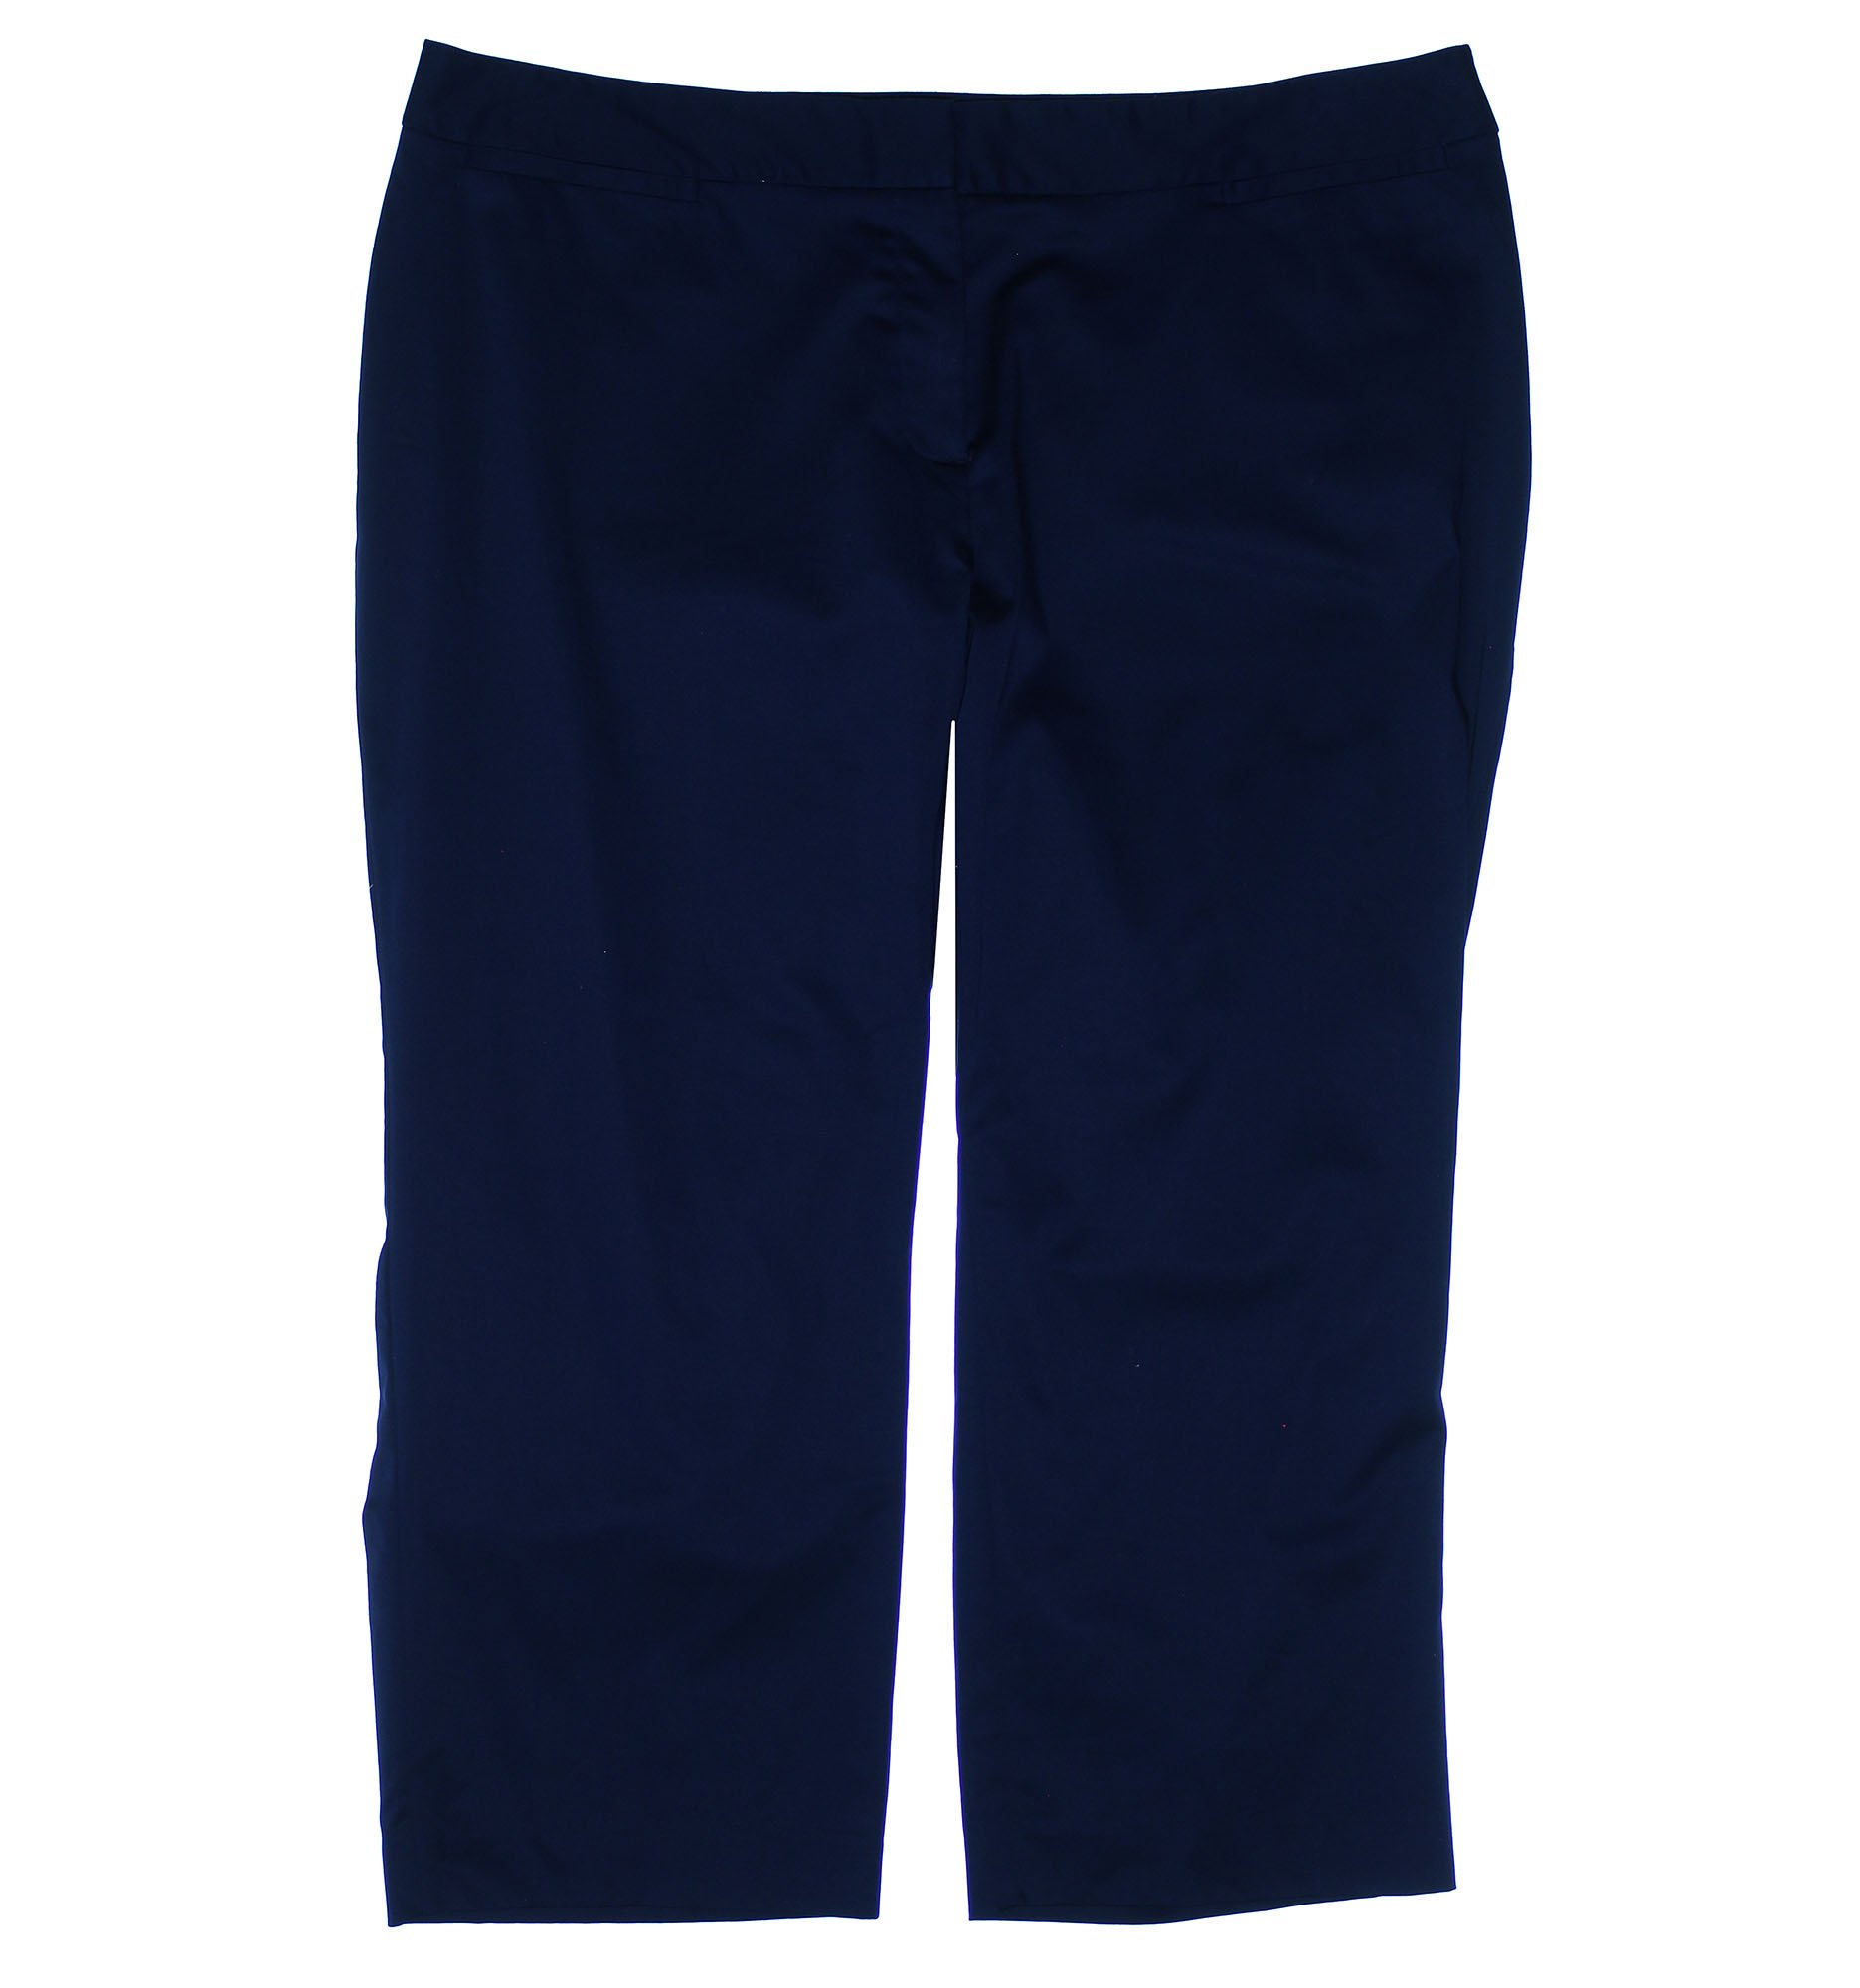 Charter Club Women's Plus Tummy Slimming Cropped Pants 18w Intrepid Blue